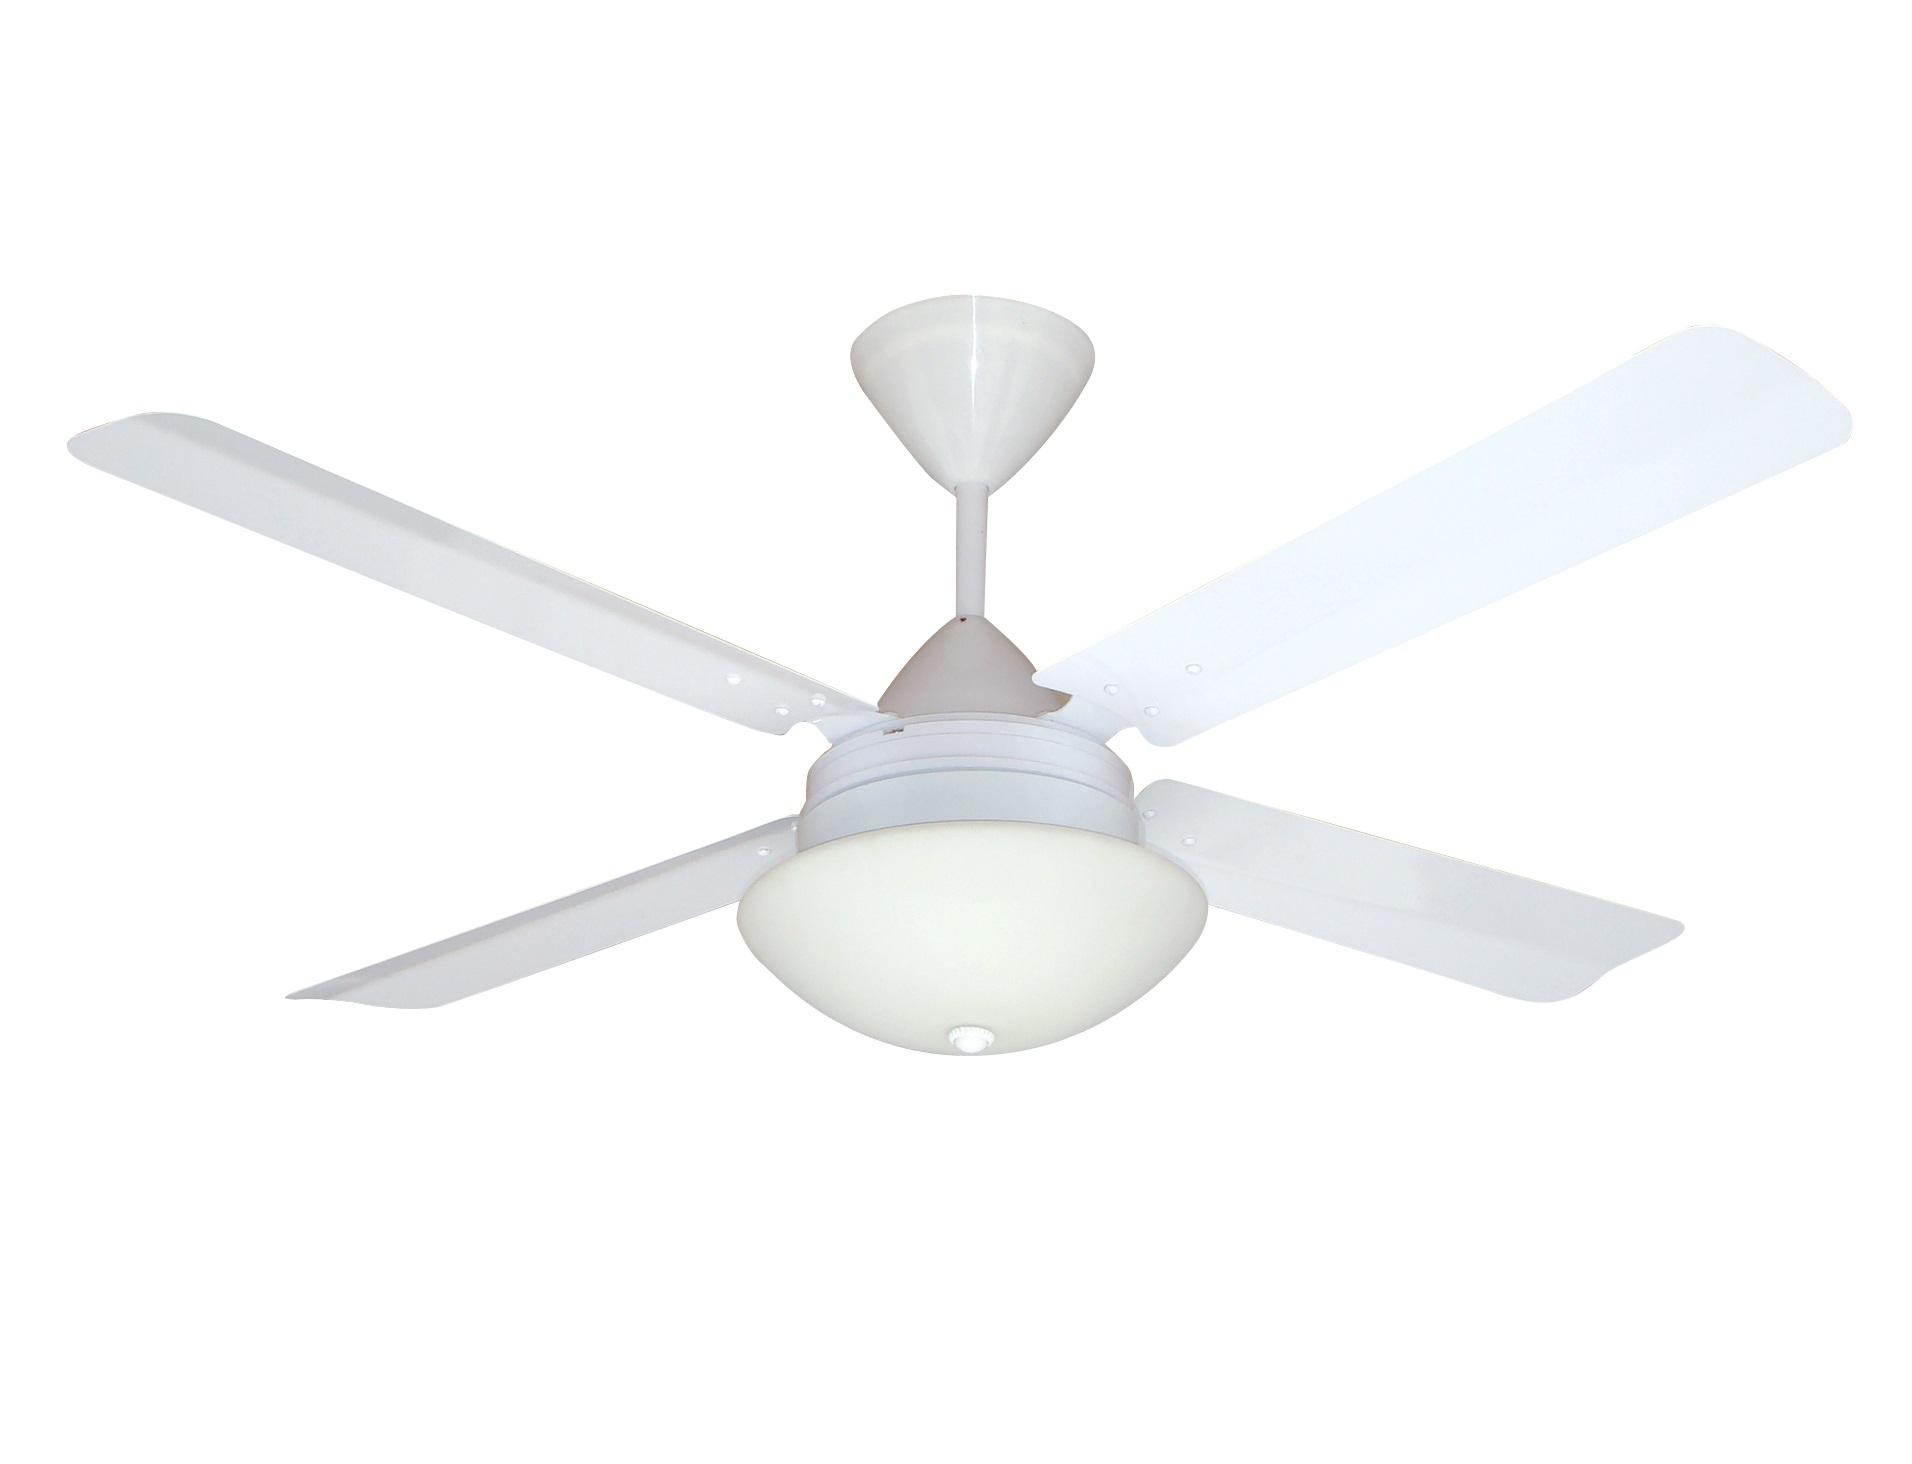 ceiling and photo ceilings lighting ideas fan blade single fans